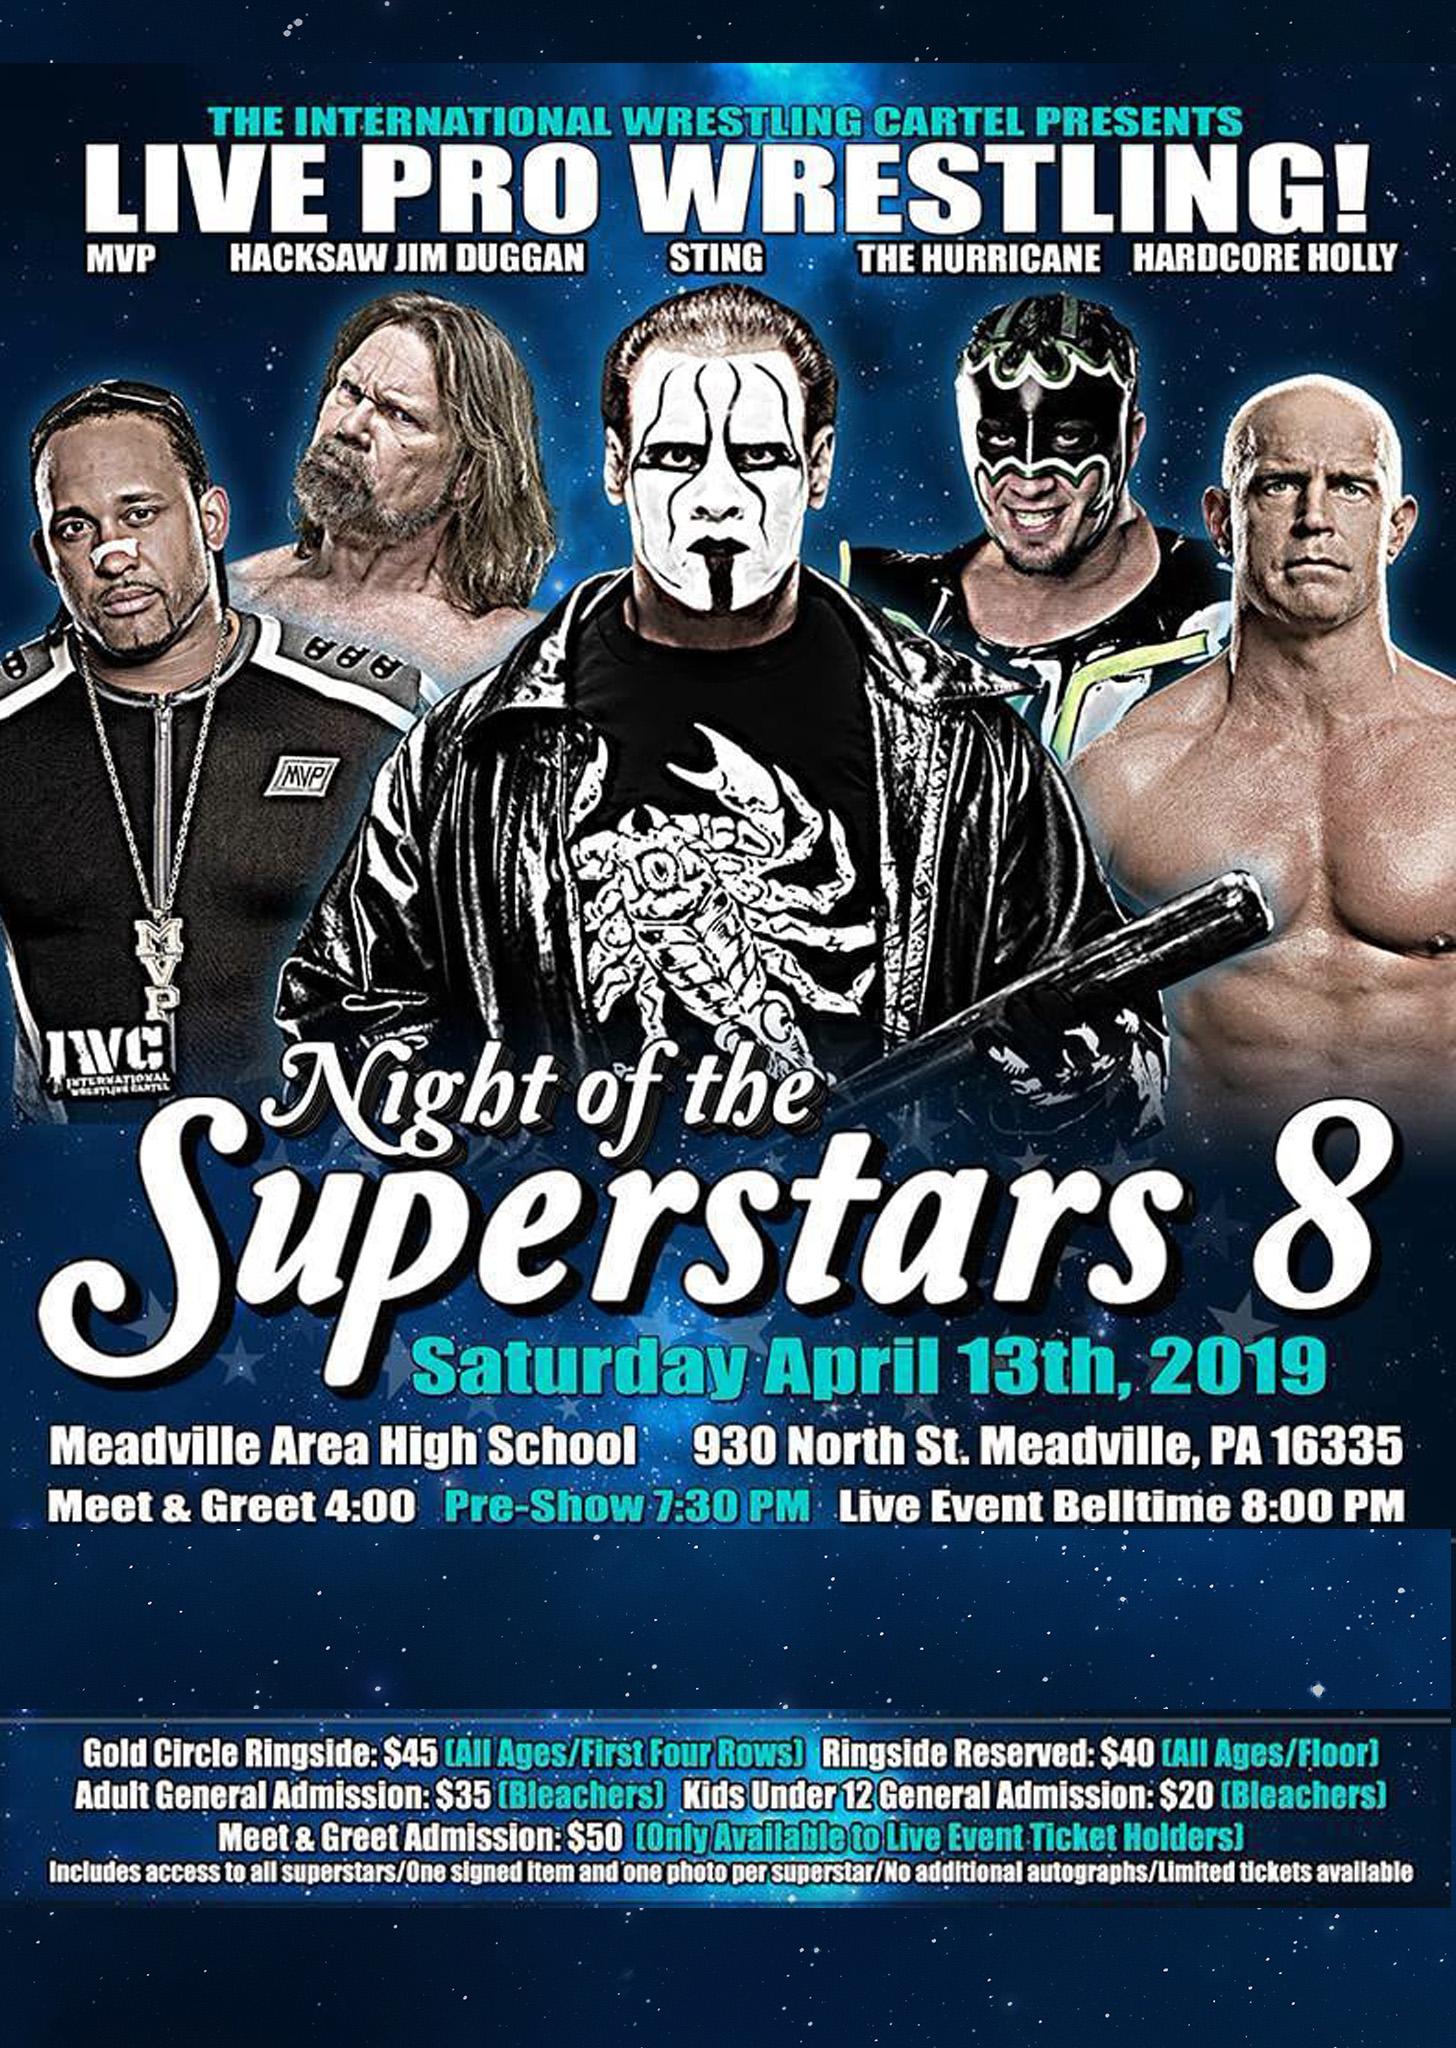 04.13.2019 Night of the Superstars 8 (2019).jpg